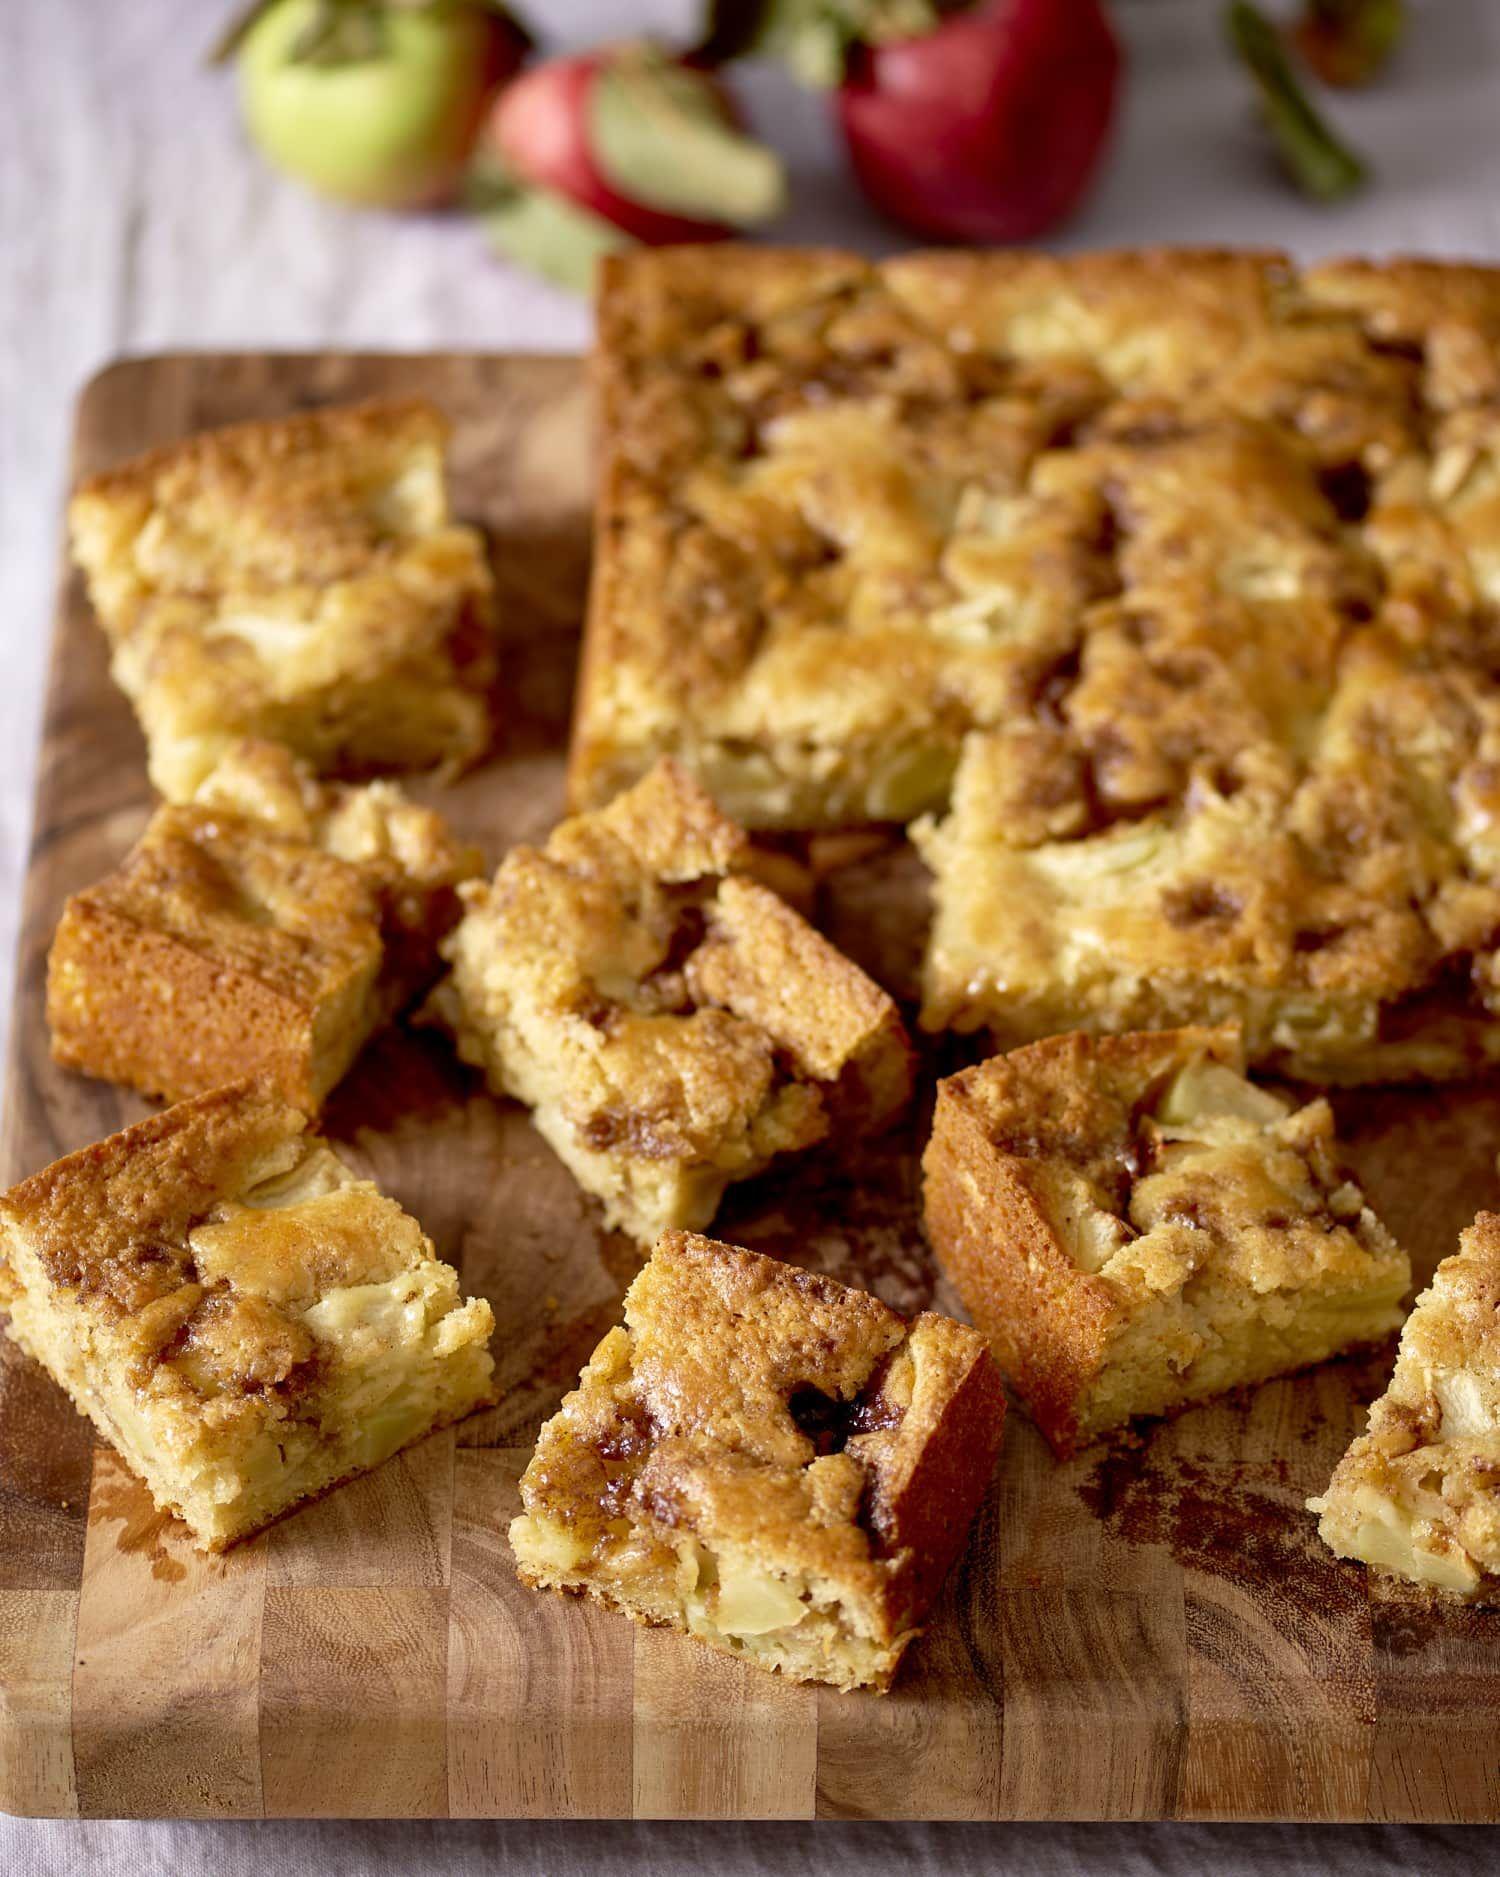 Apple Yogurt Cake With A Cinnamon Sugar Streak Recipe With Images Yogurt Cake Apple Recipes Dessert Recipes